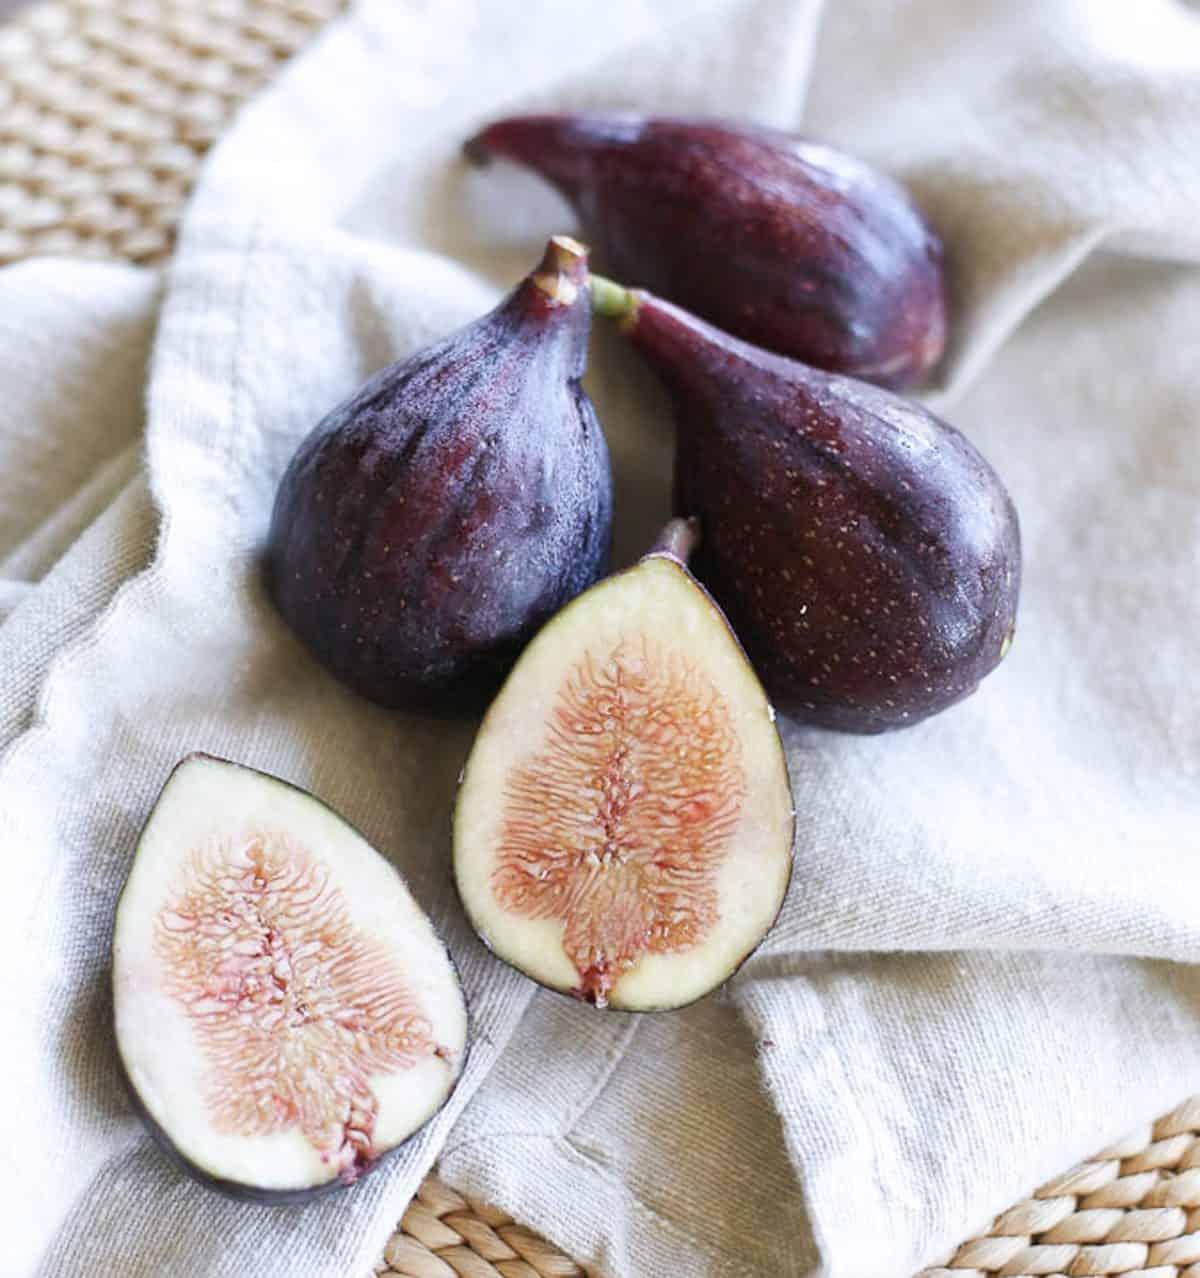 California Grown Figs